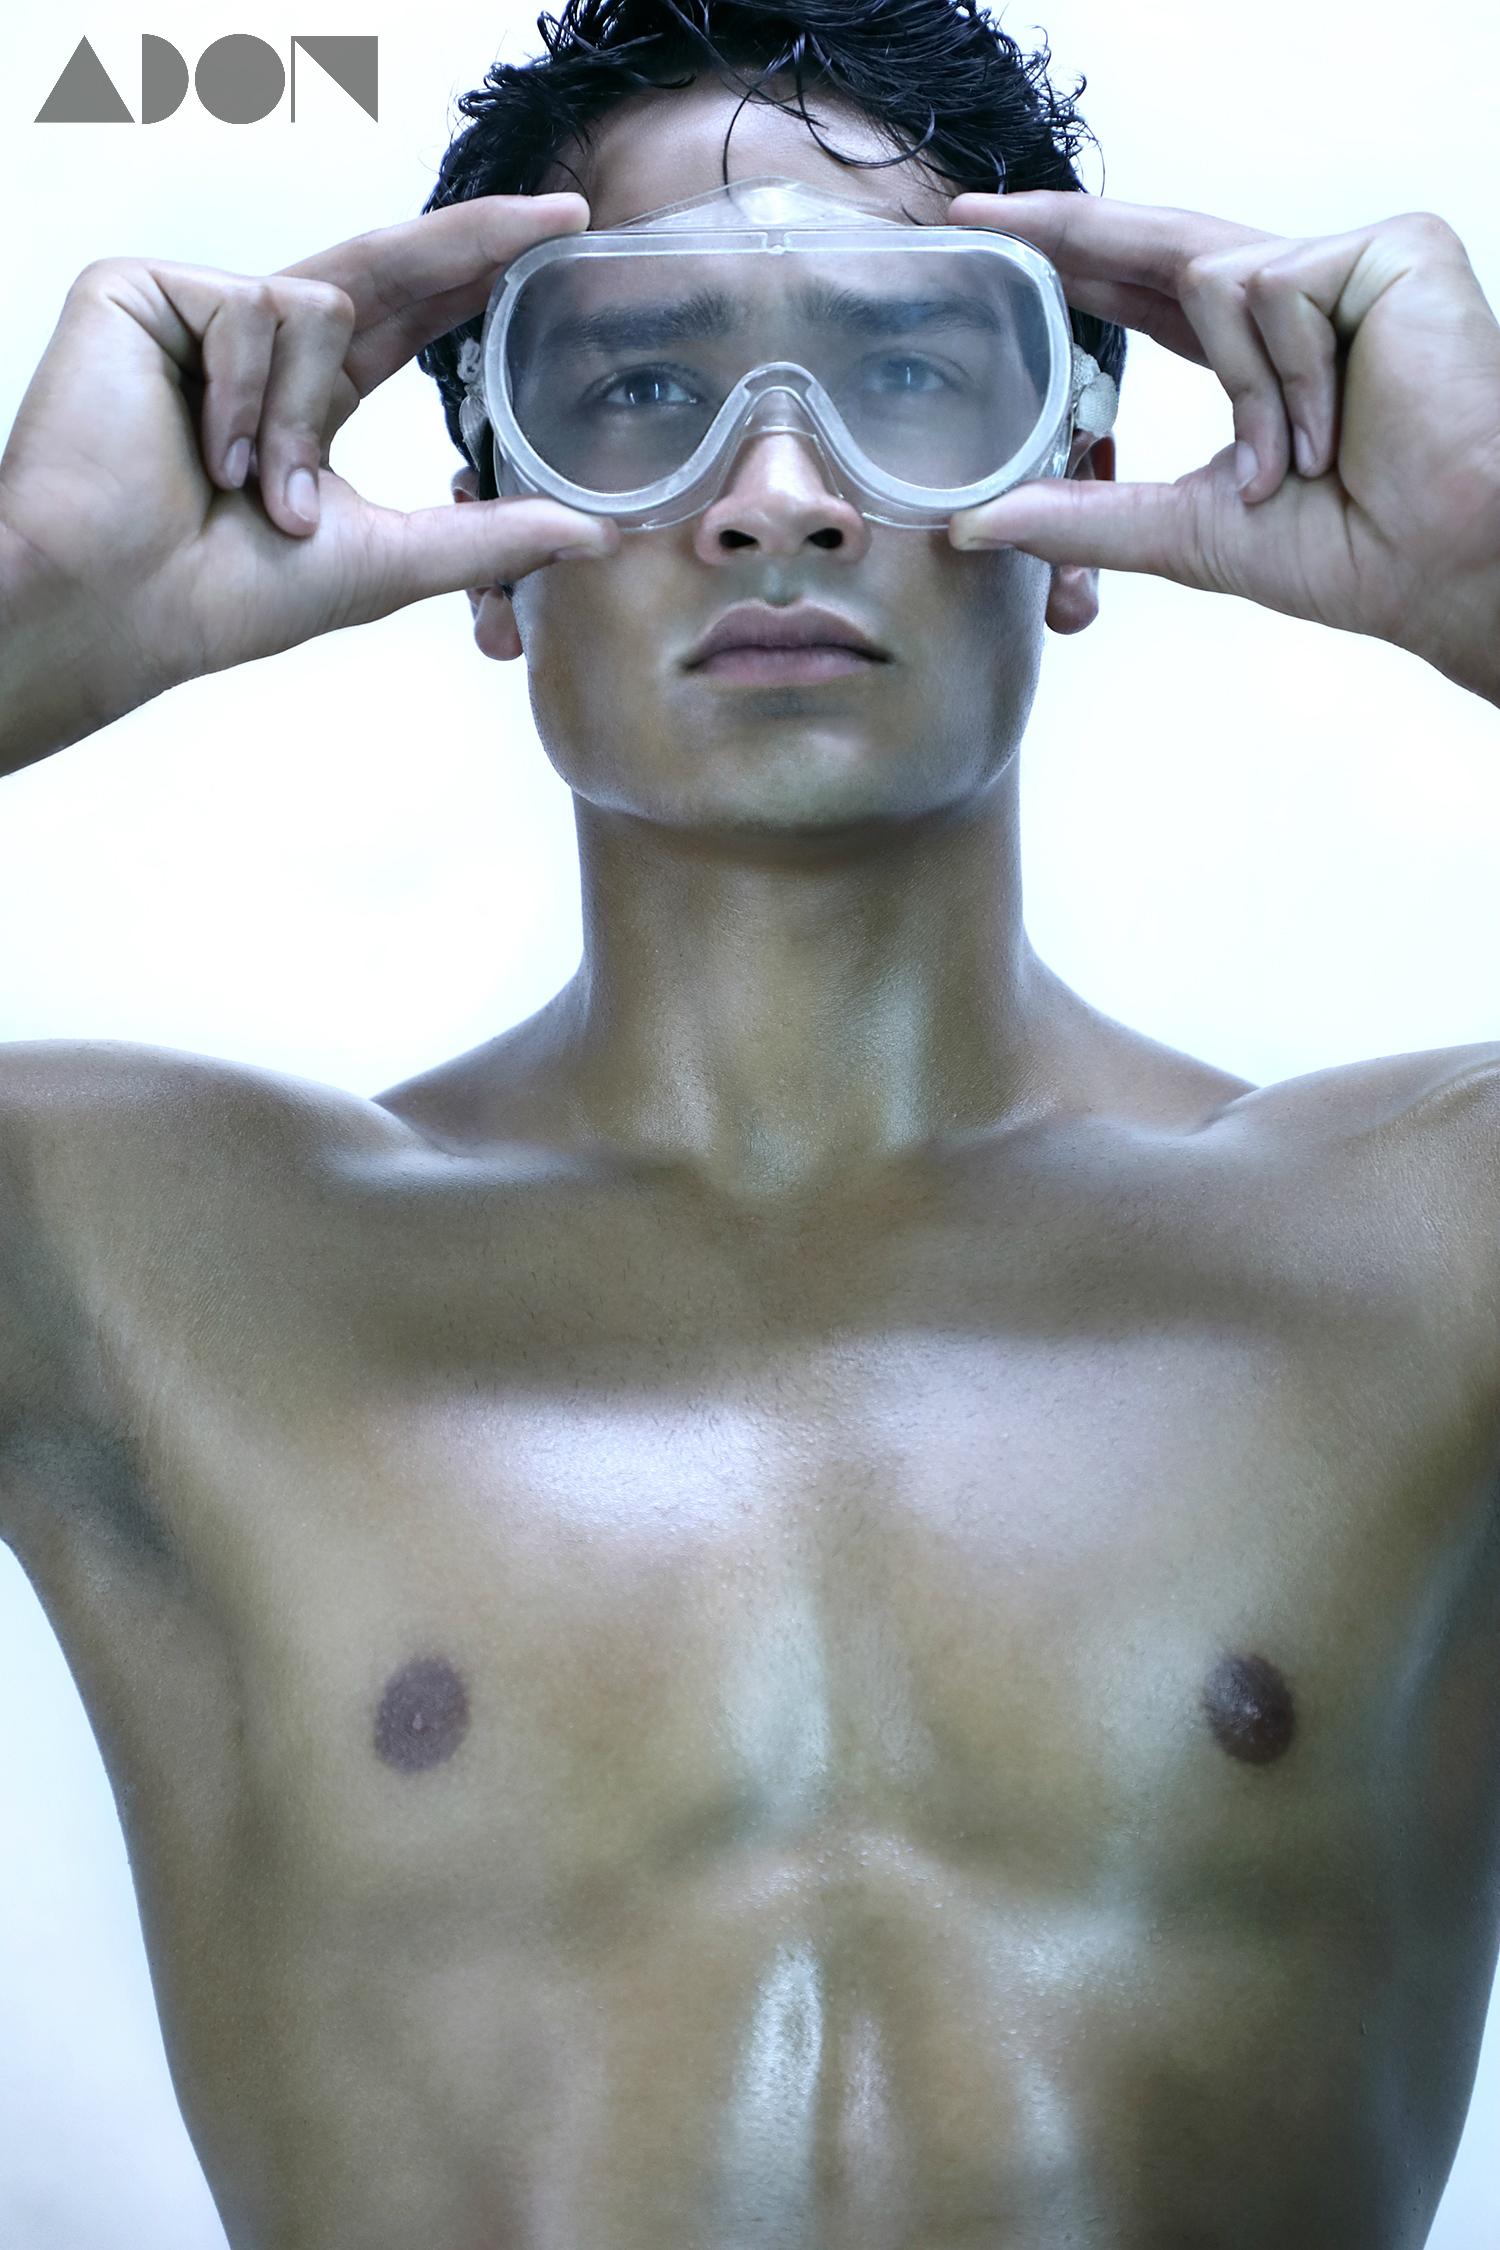 Adon Exclusive: Model Daniel Morres By Arthur Tselishchev